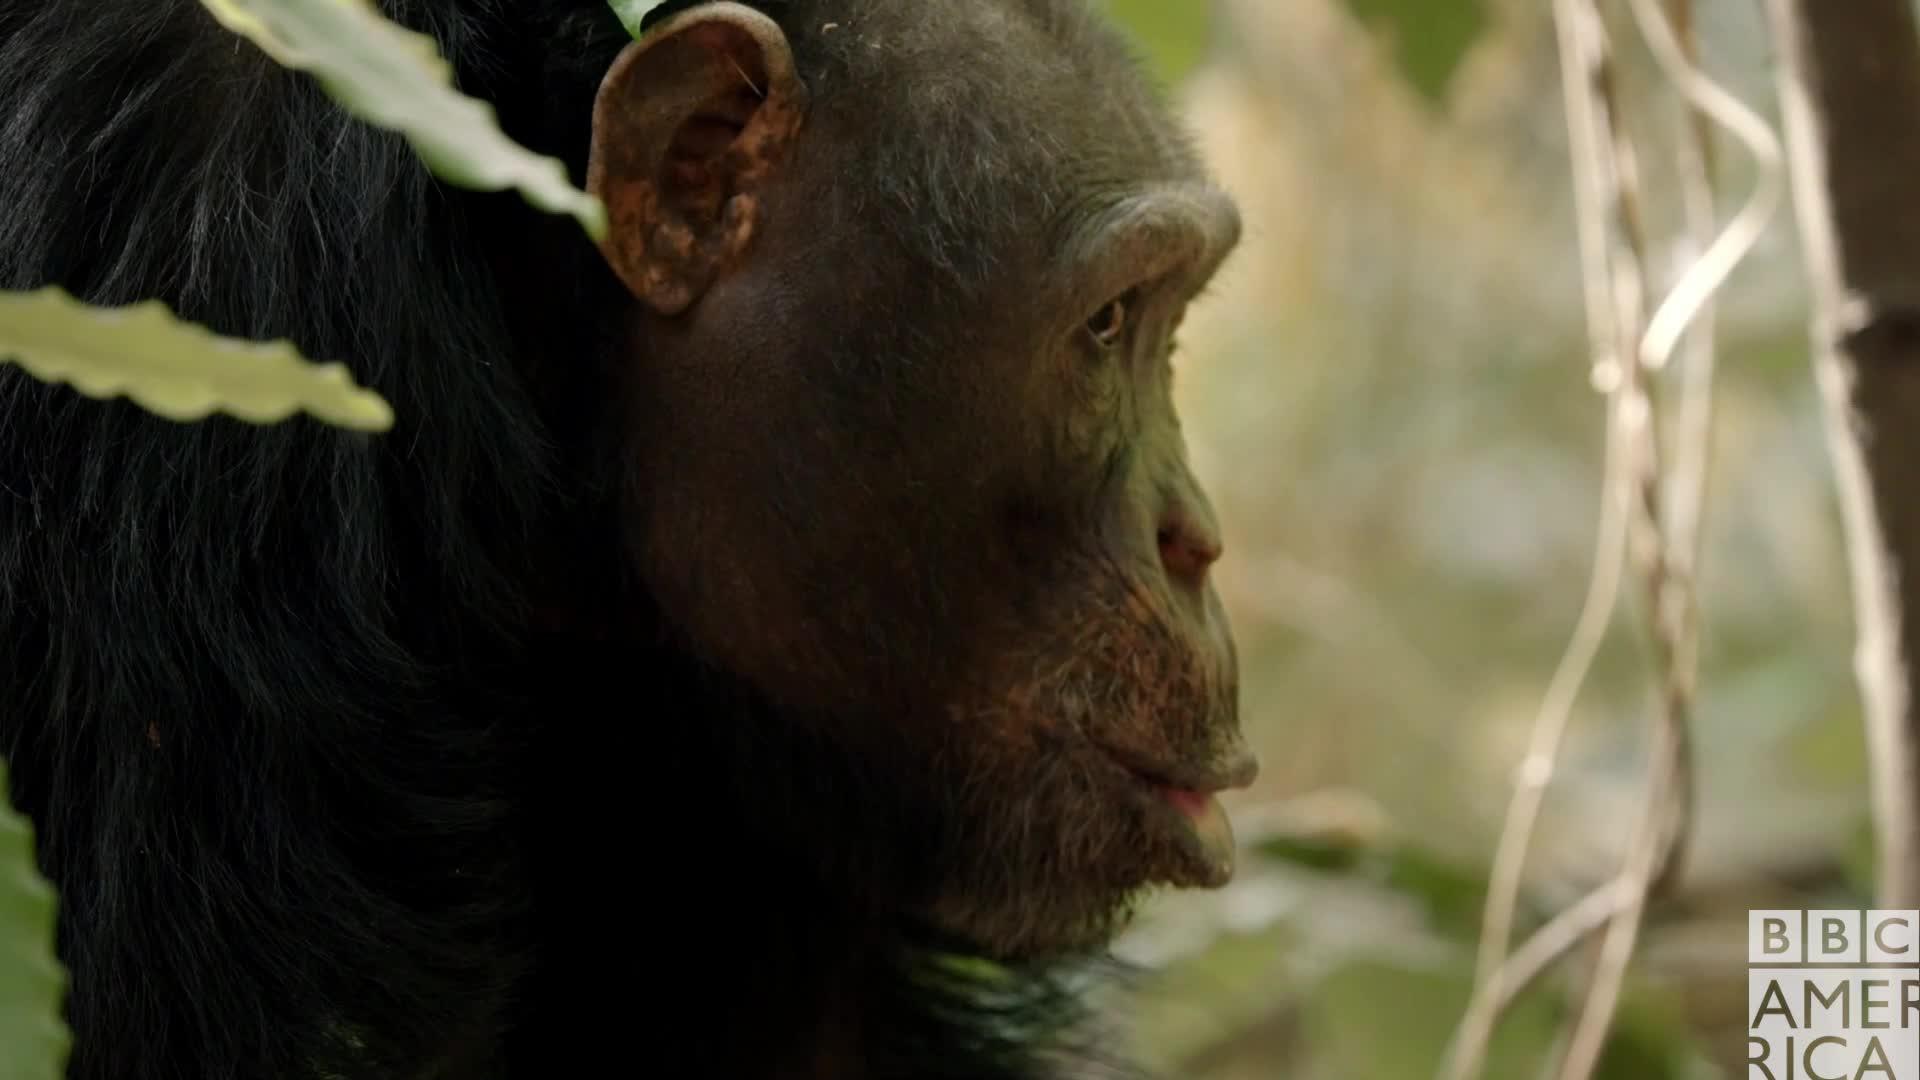 animal, animals, bbc america, bbc america dynasties, bbc america: dynasties, chimp, chimpanzee, chimpanzees, chimps, dynasties, Dynasties Chimp Kiss Lips GIFs